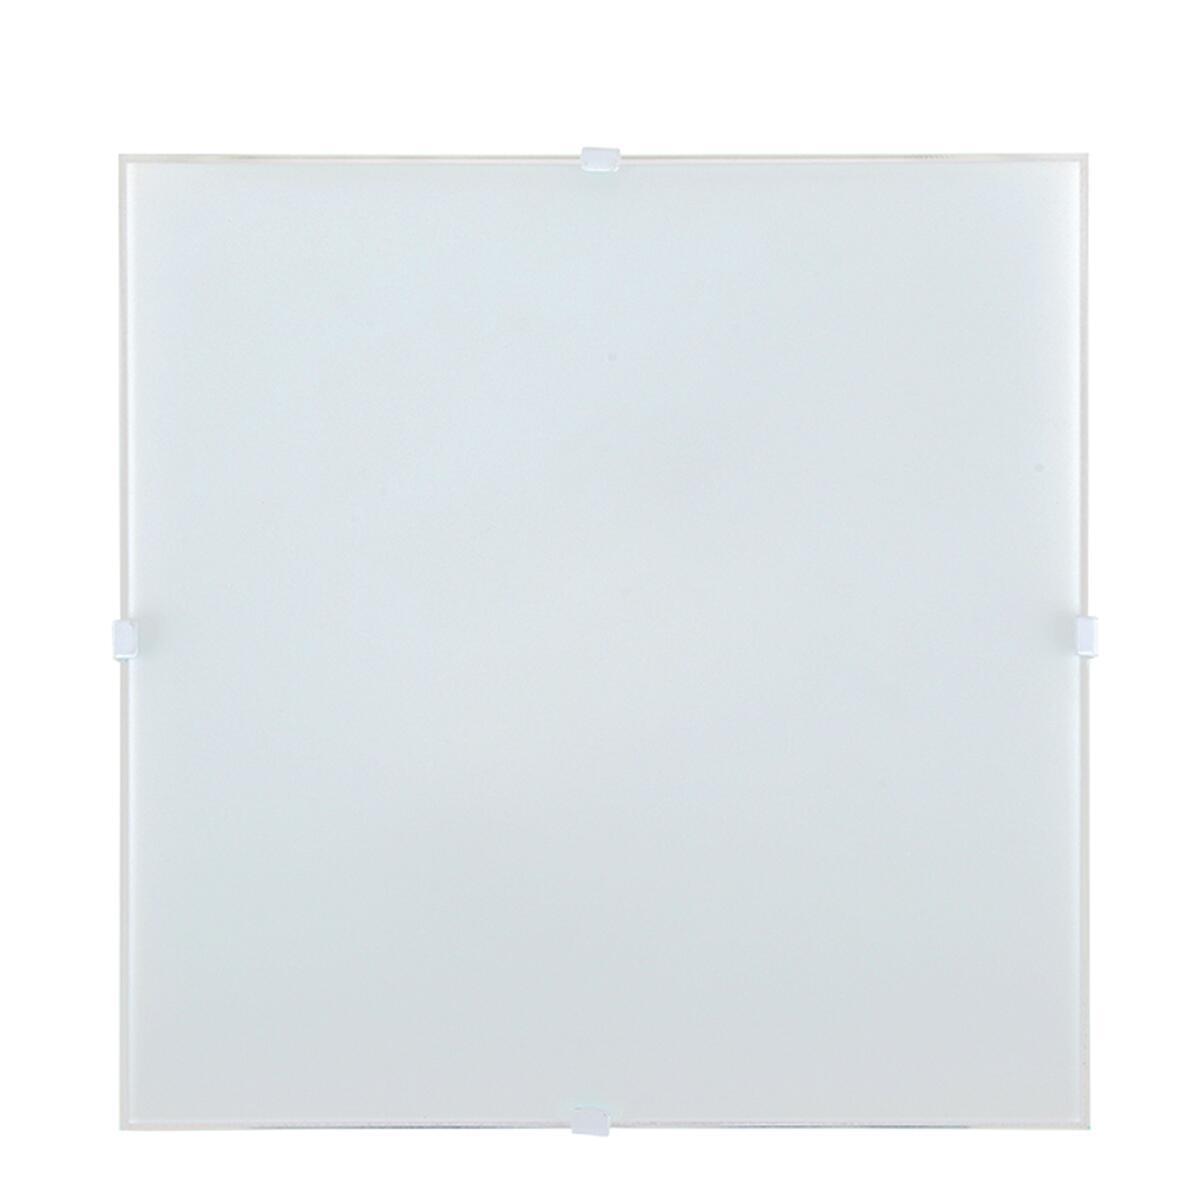 Applique classico Brixen bianco, in vetro, 25.8x25.8 cm, - 1